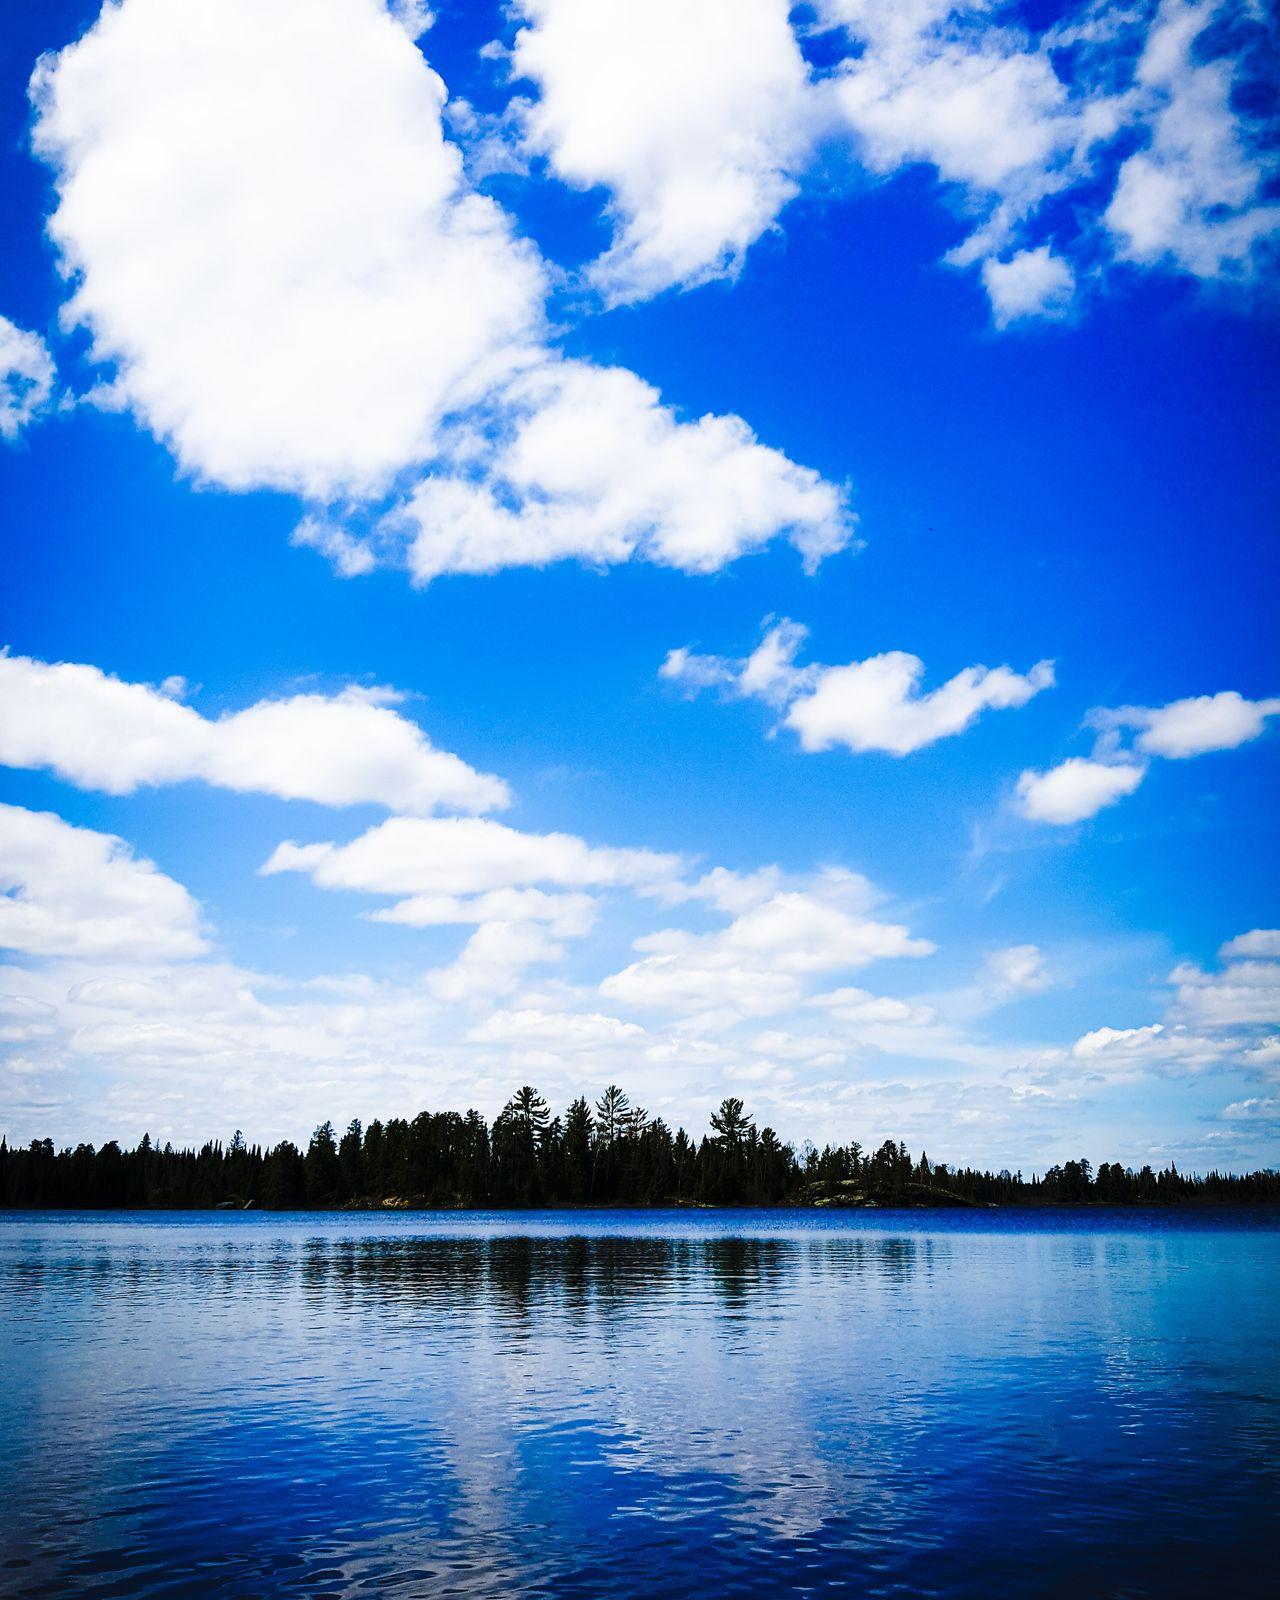 BWCA Cloud - Sky Nature Water Blue Tree Lake Scenics Sky Outdoors Tranquility No People Beauty In Nature Day Landscape Minnesotalife Minnesota Lake Minnesota Nature